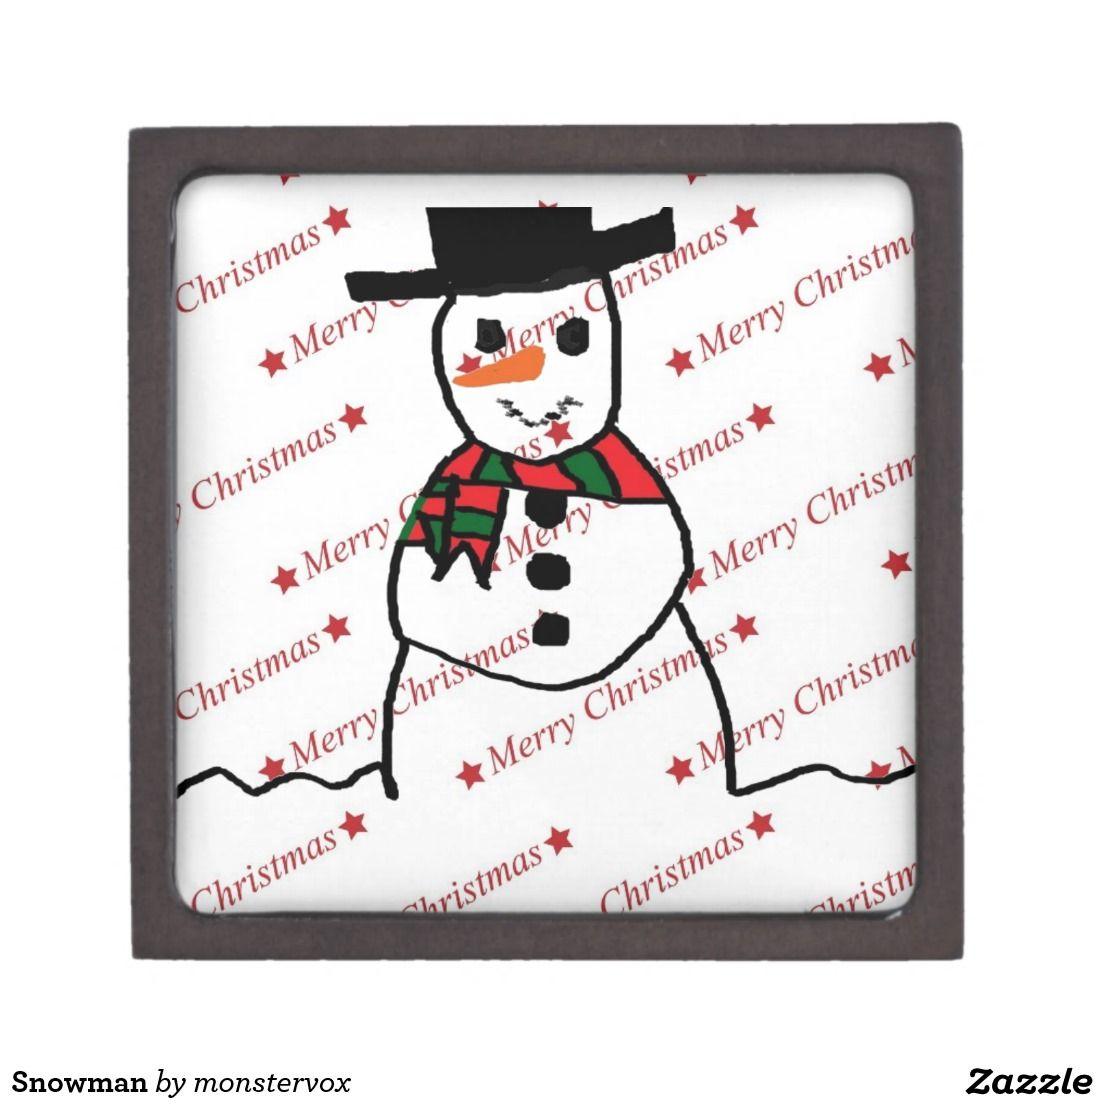 Snowman Keepsake Box #Snowman #Snow #Snowflake #Winter #Holiday #Christmas #Jewelry #Keepsake #Trinket #Gift #Box